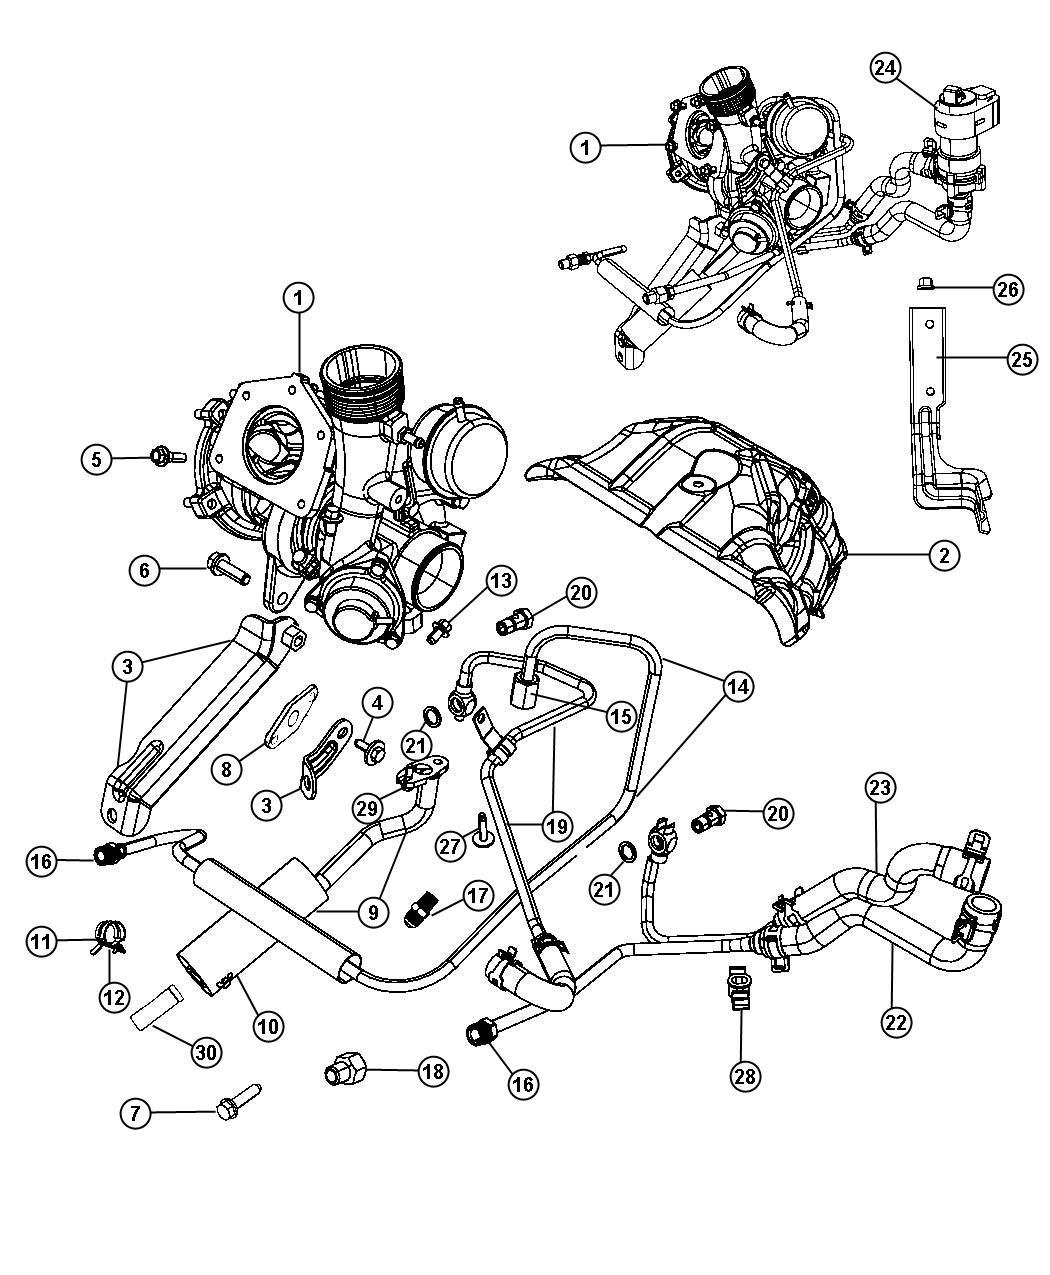 dodge neon 2 0 engine belt diagram 08 dodge caliber 2 0 engine diagram